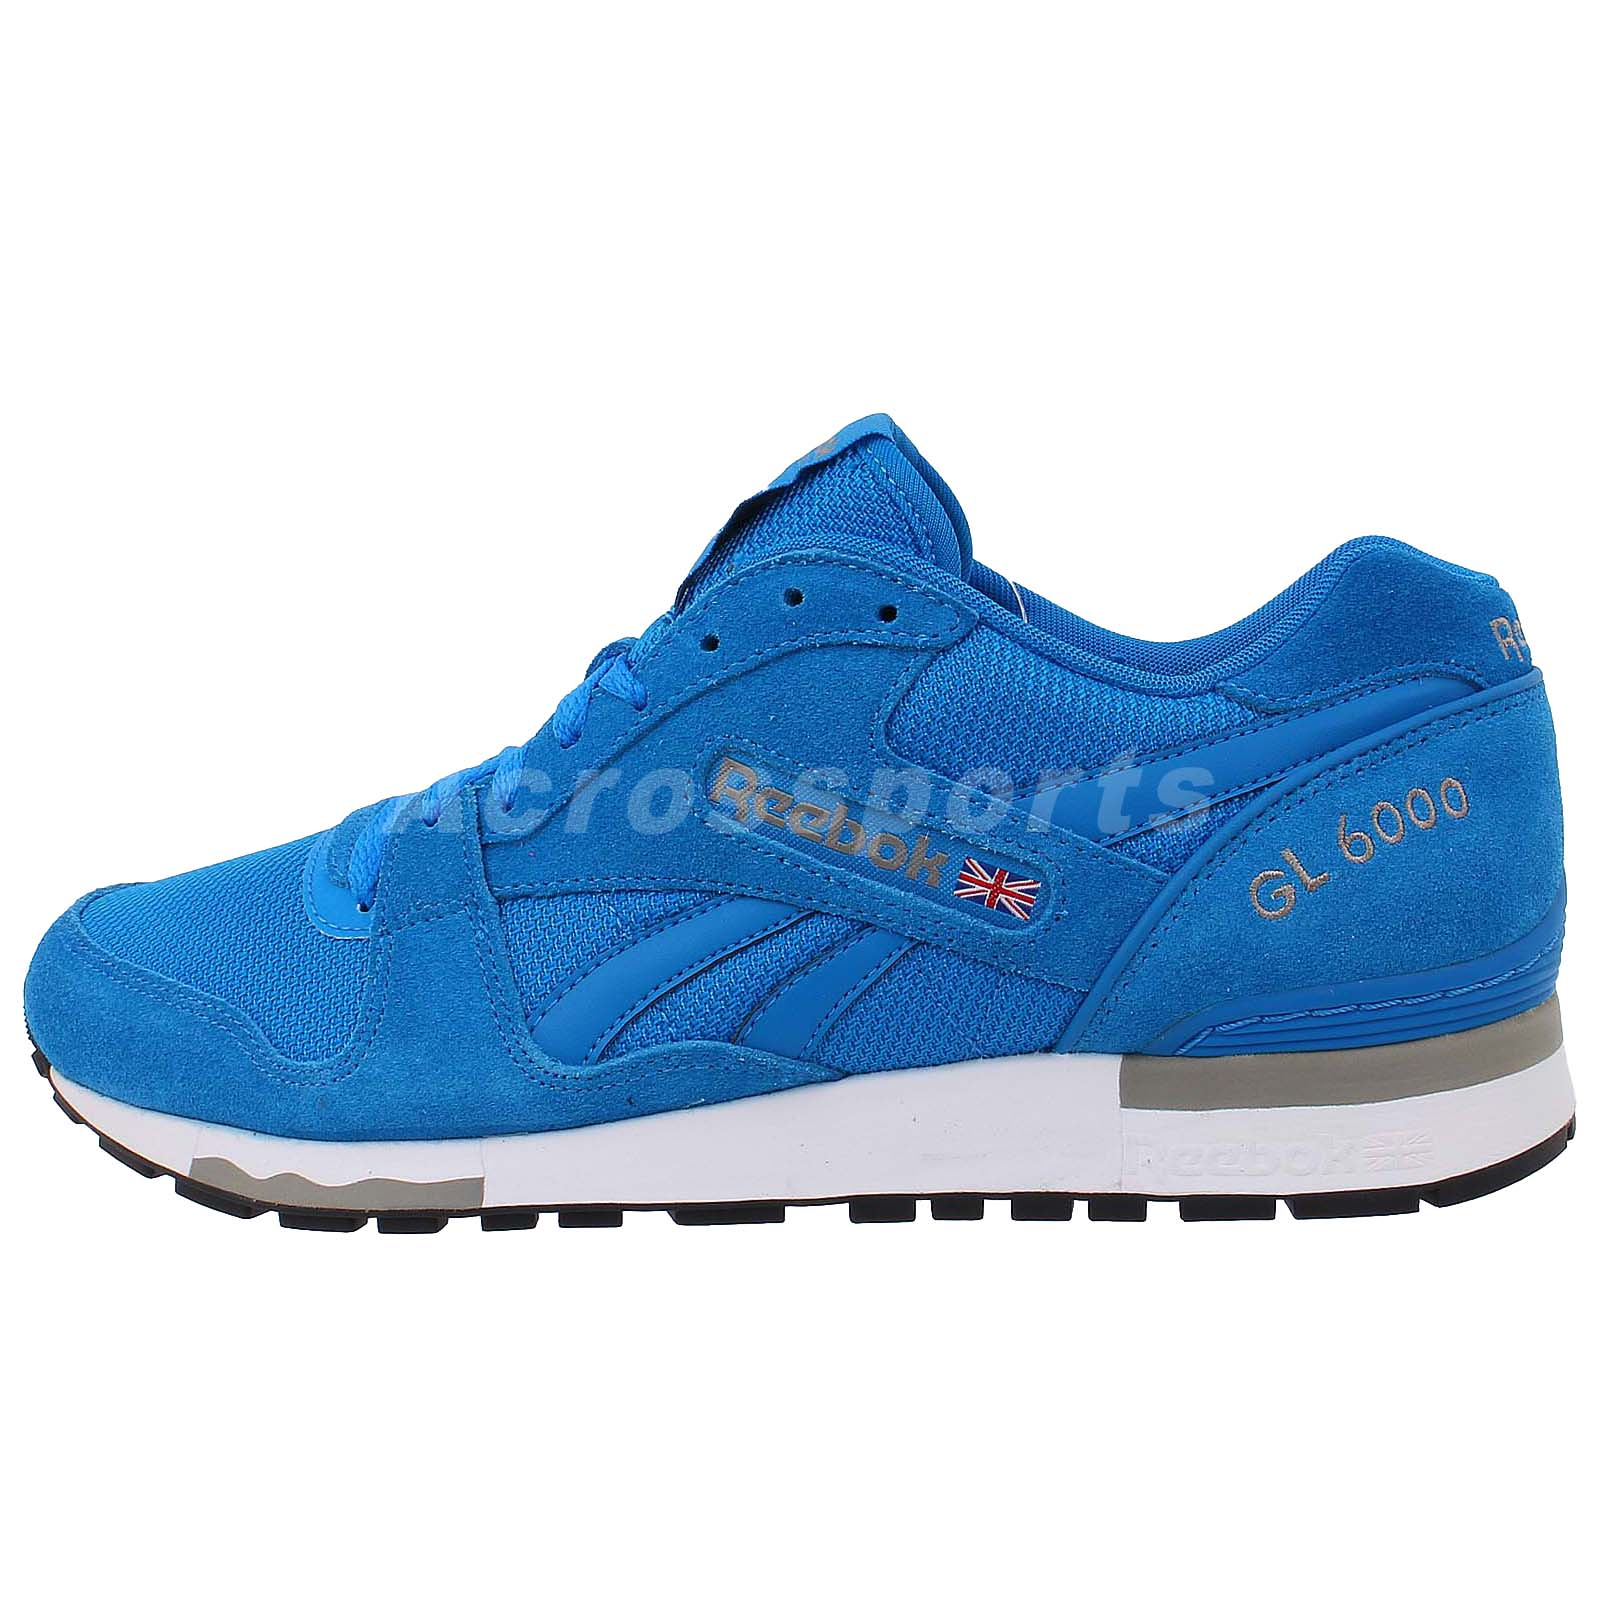 Reebok Running Shoes 2013 Reebok GL 6000 Suede 2...